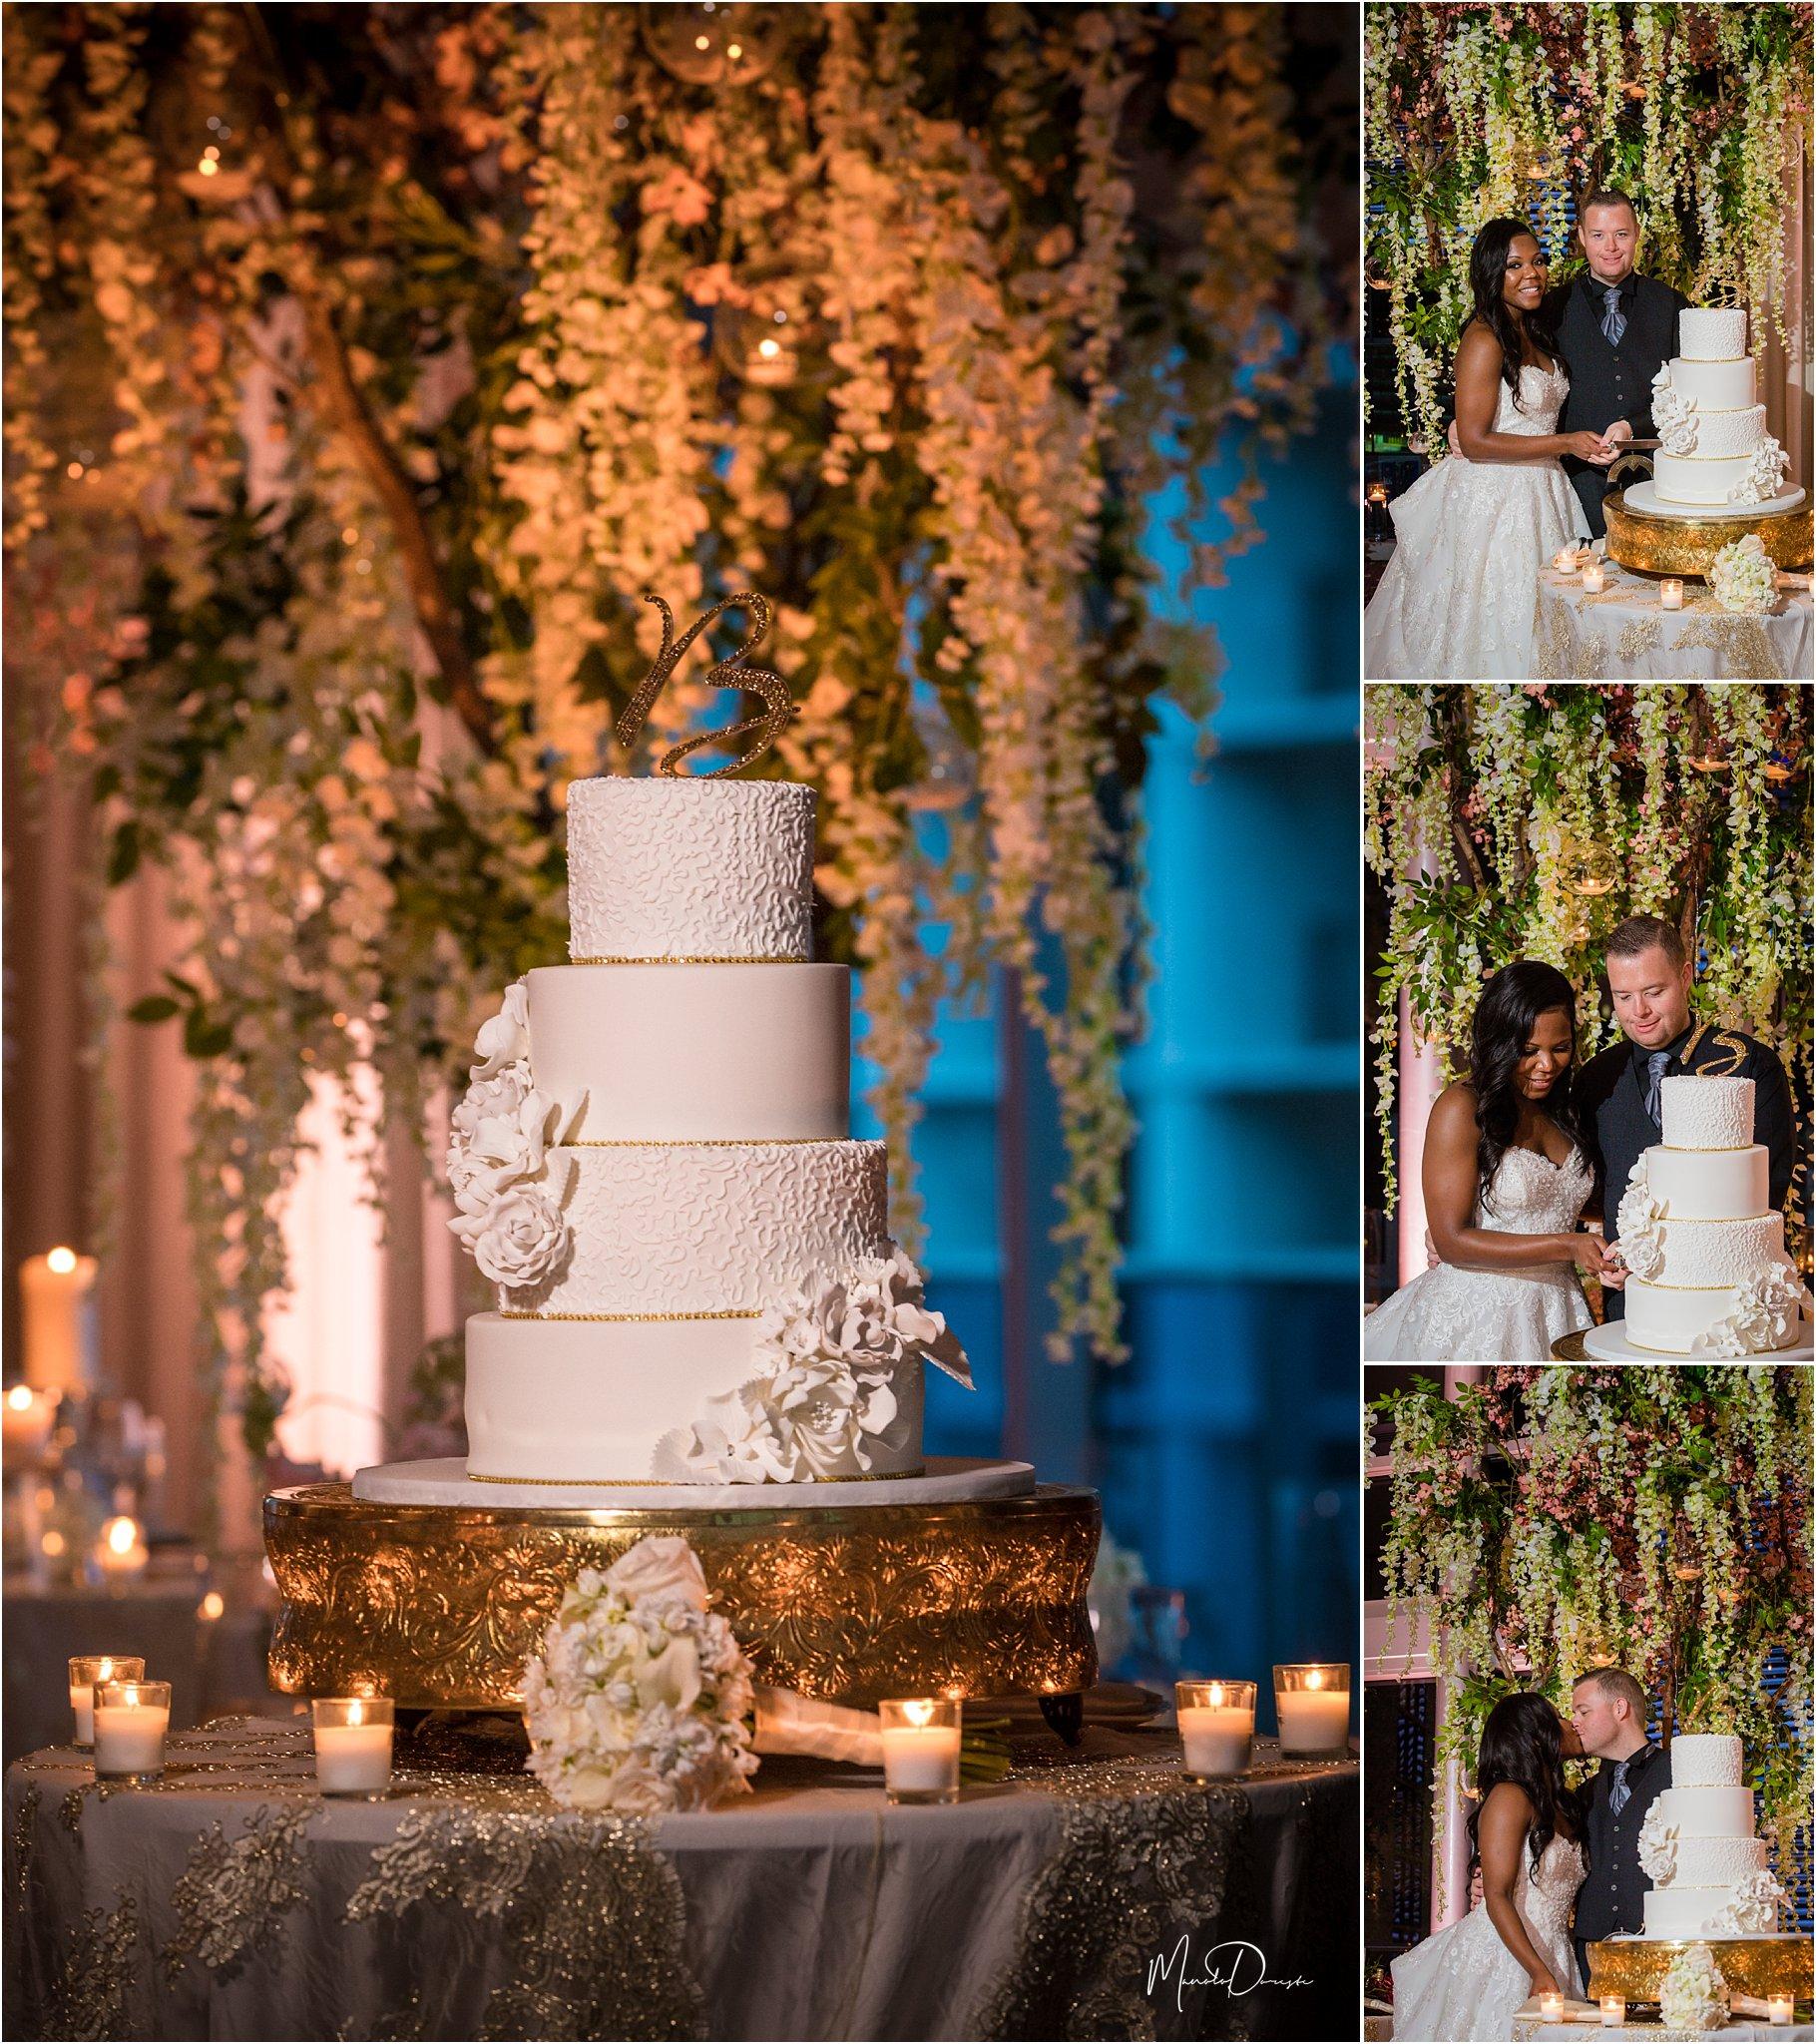 0131_ManoloDoreste_InFocusStudios_Wedding_Family_Photography_Miami_MiamiPhotographer.jpg